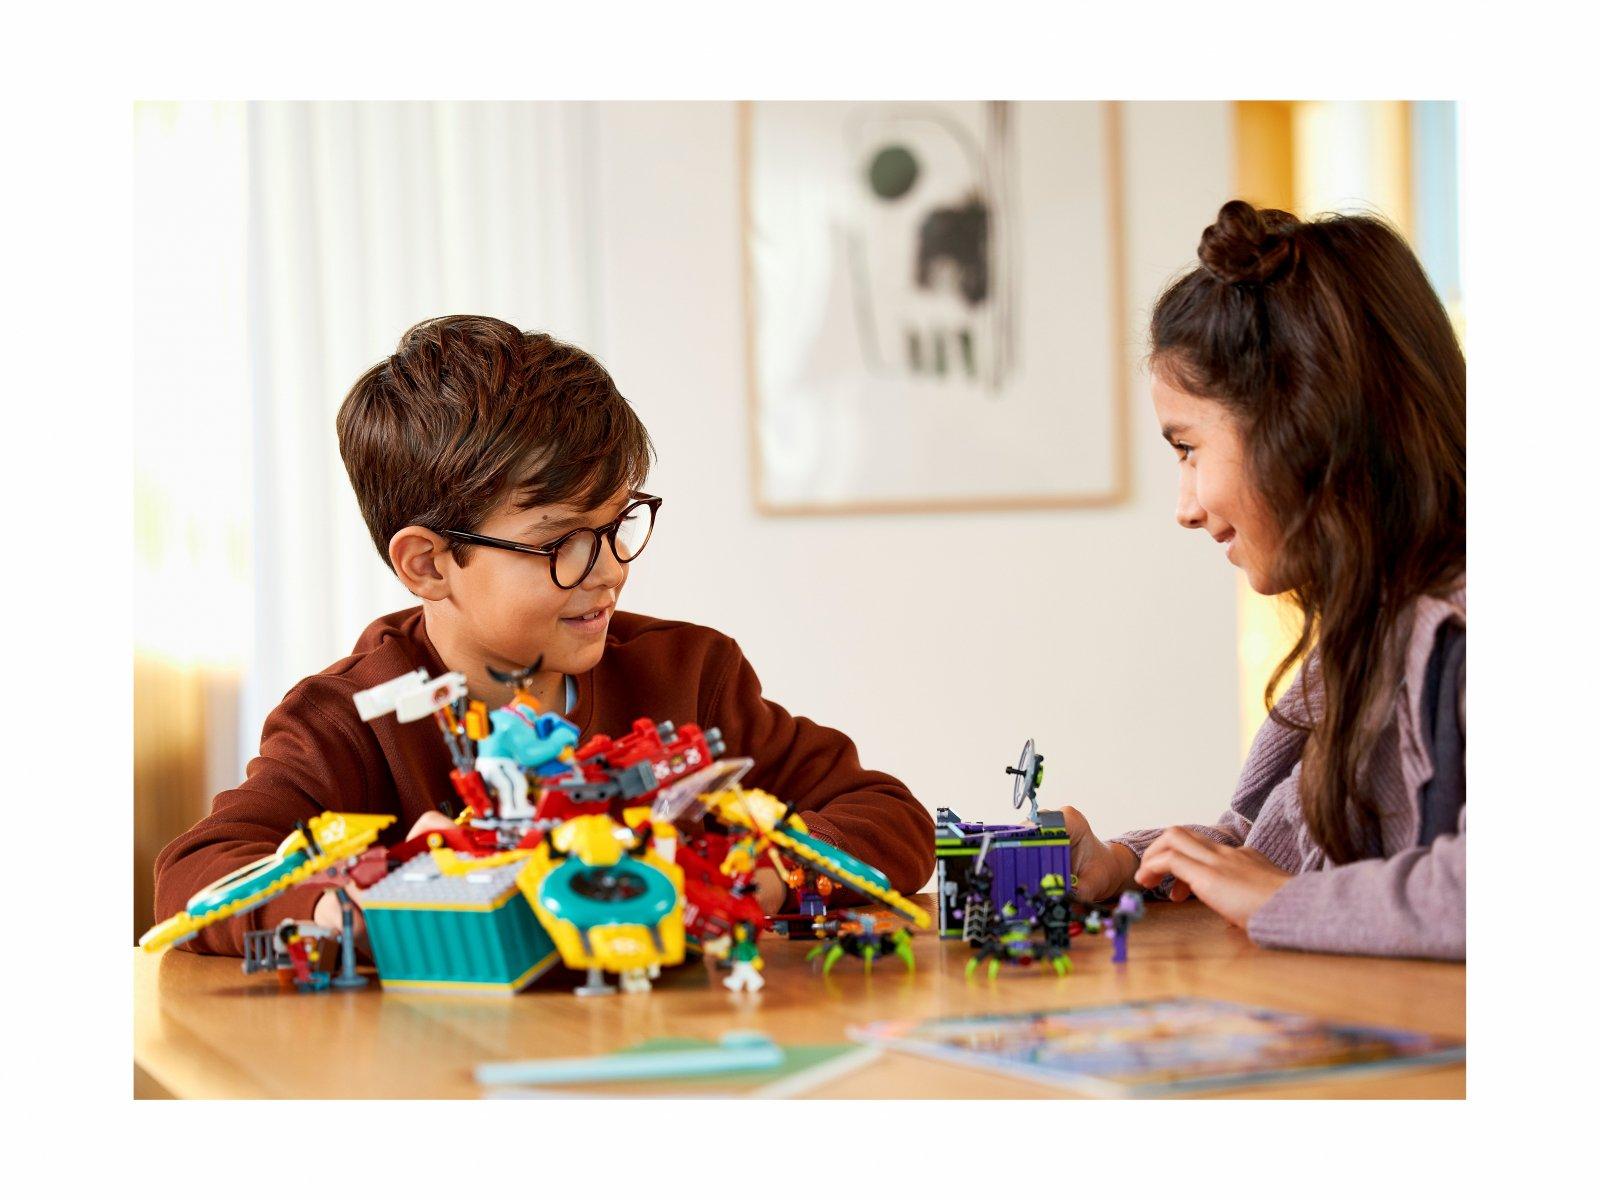 LEGO Monkie Kid 80023 Dronkopter ekipy Monkie Kida